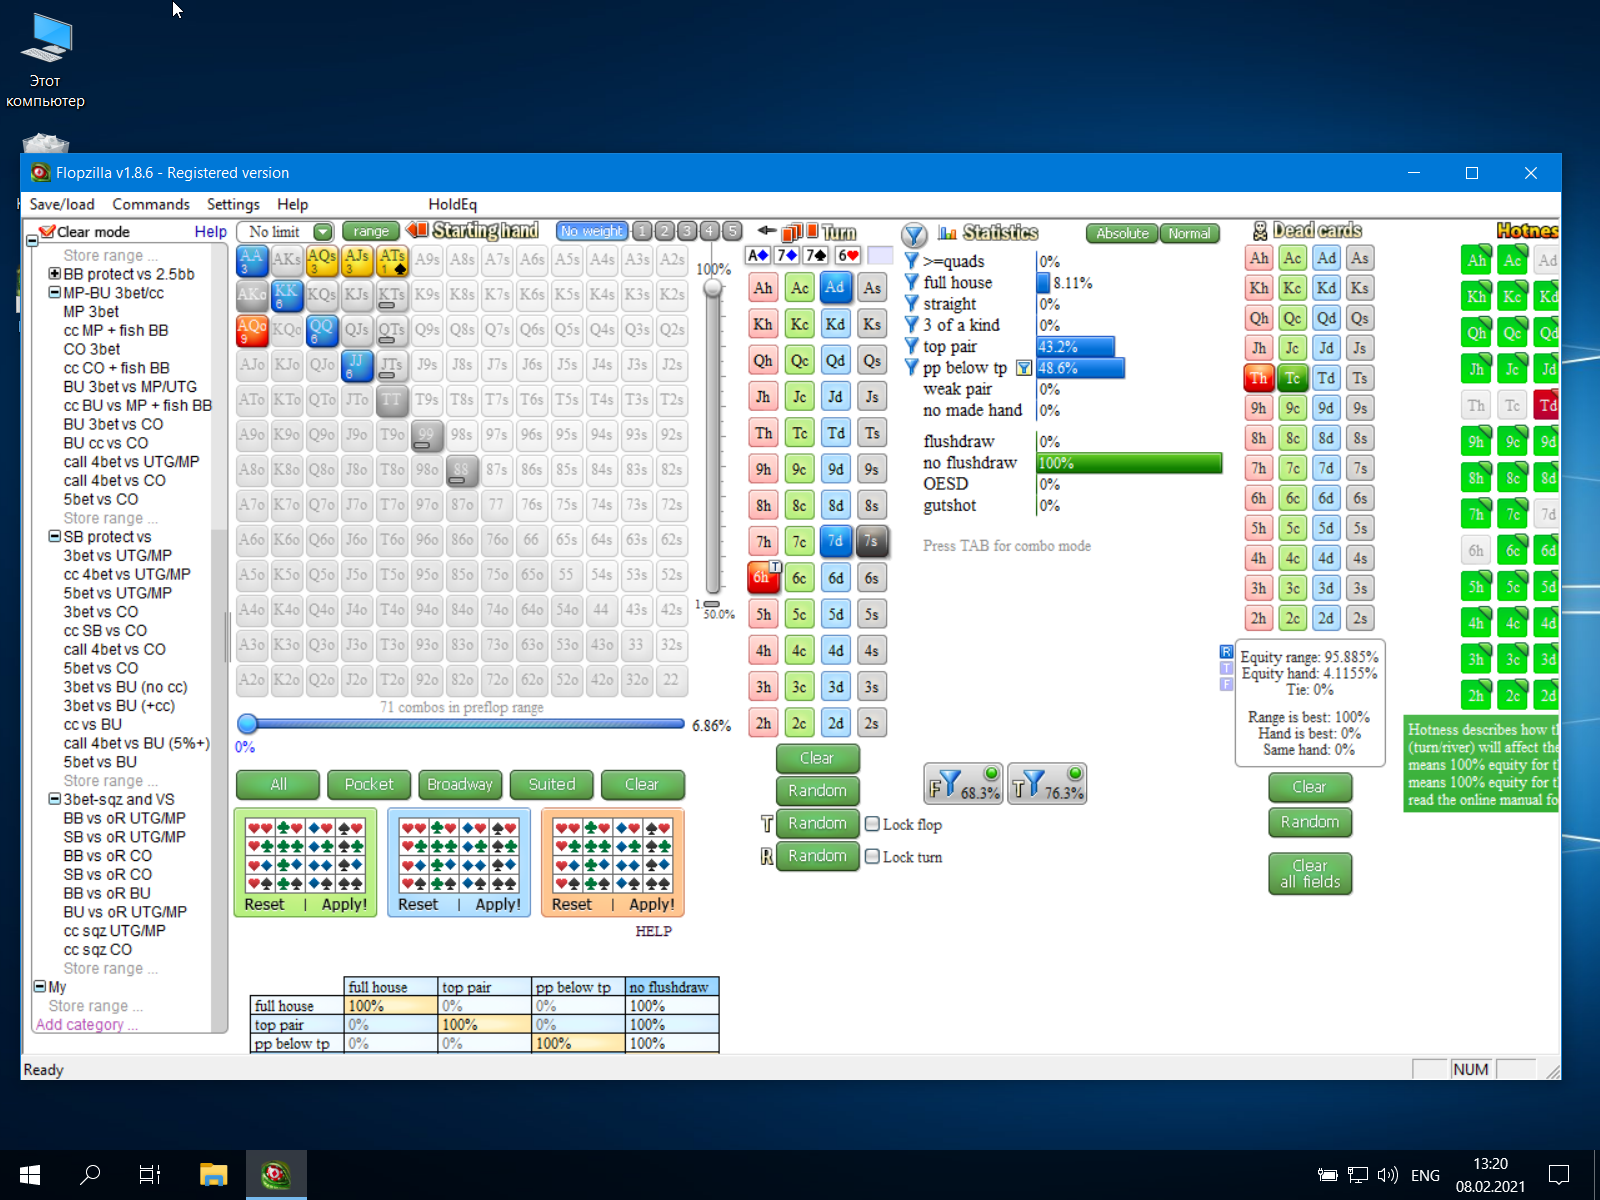 virtualboxwin-10080220211320291612779646.png